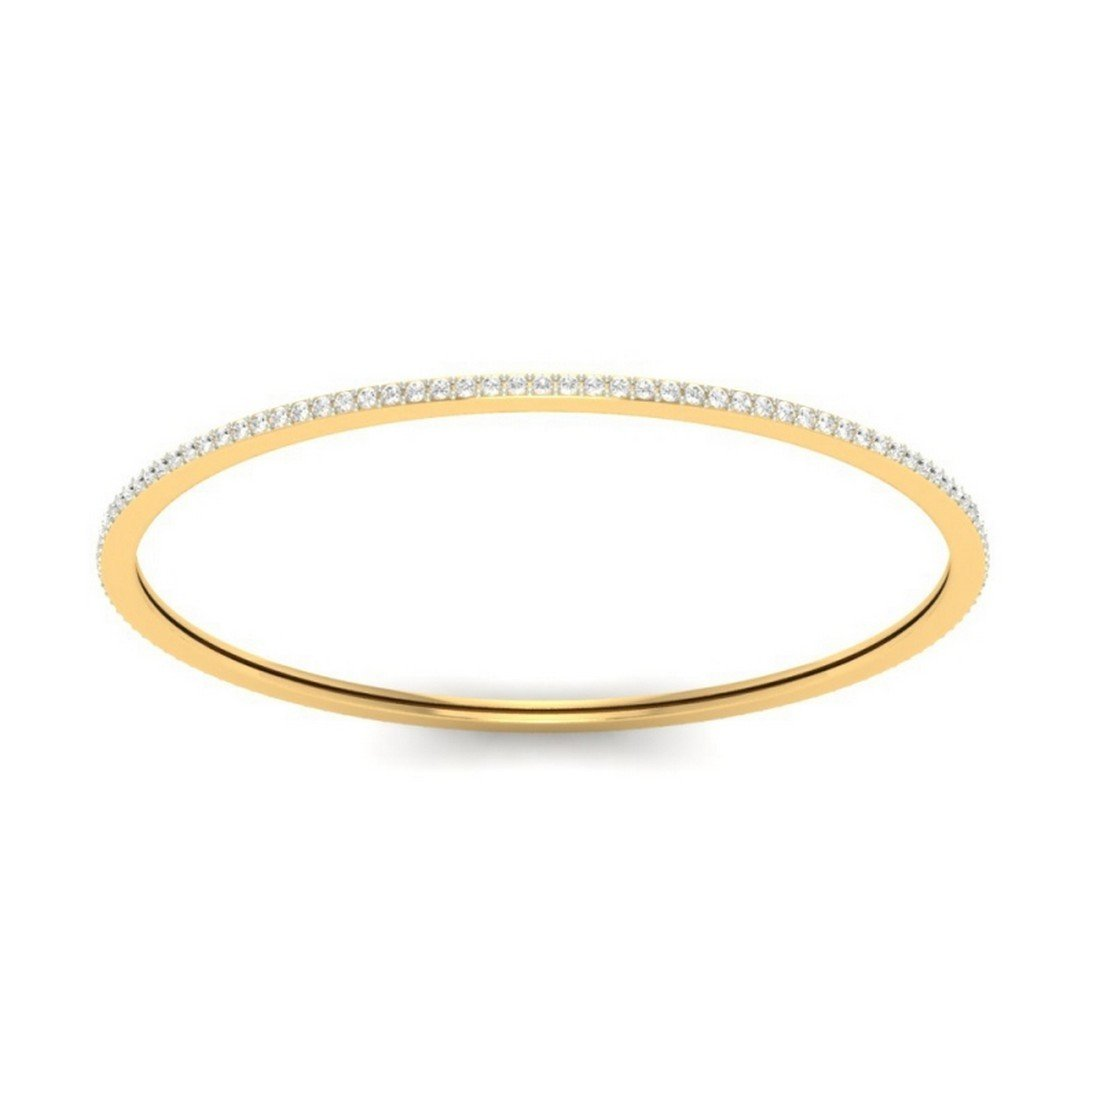 HallMarked 2.12 cttw Round-Cut-Diamond IJ| SI bangle-bracelets Size 9.75 inches 14K Yellow Gold